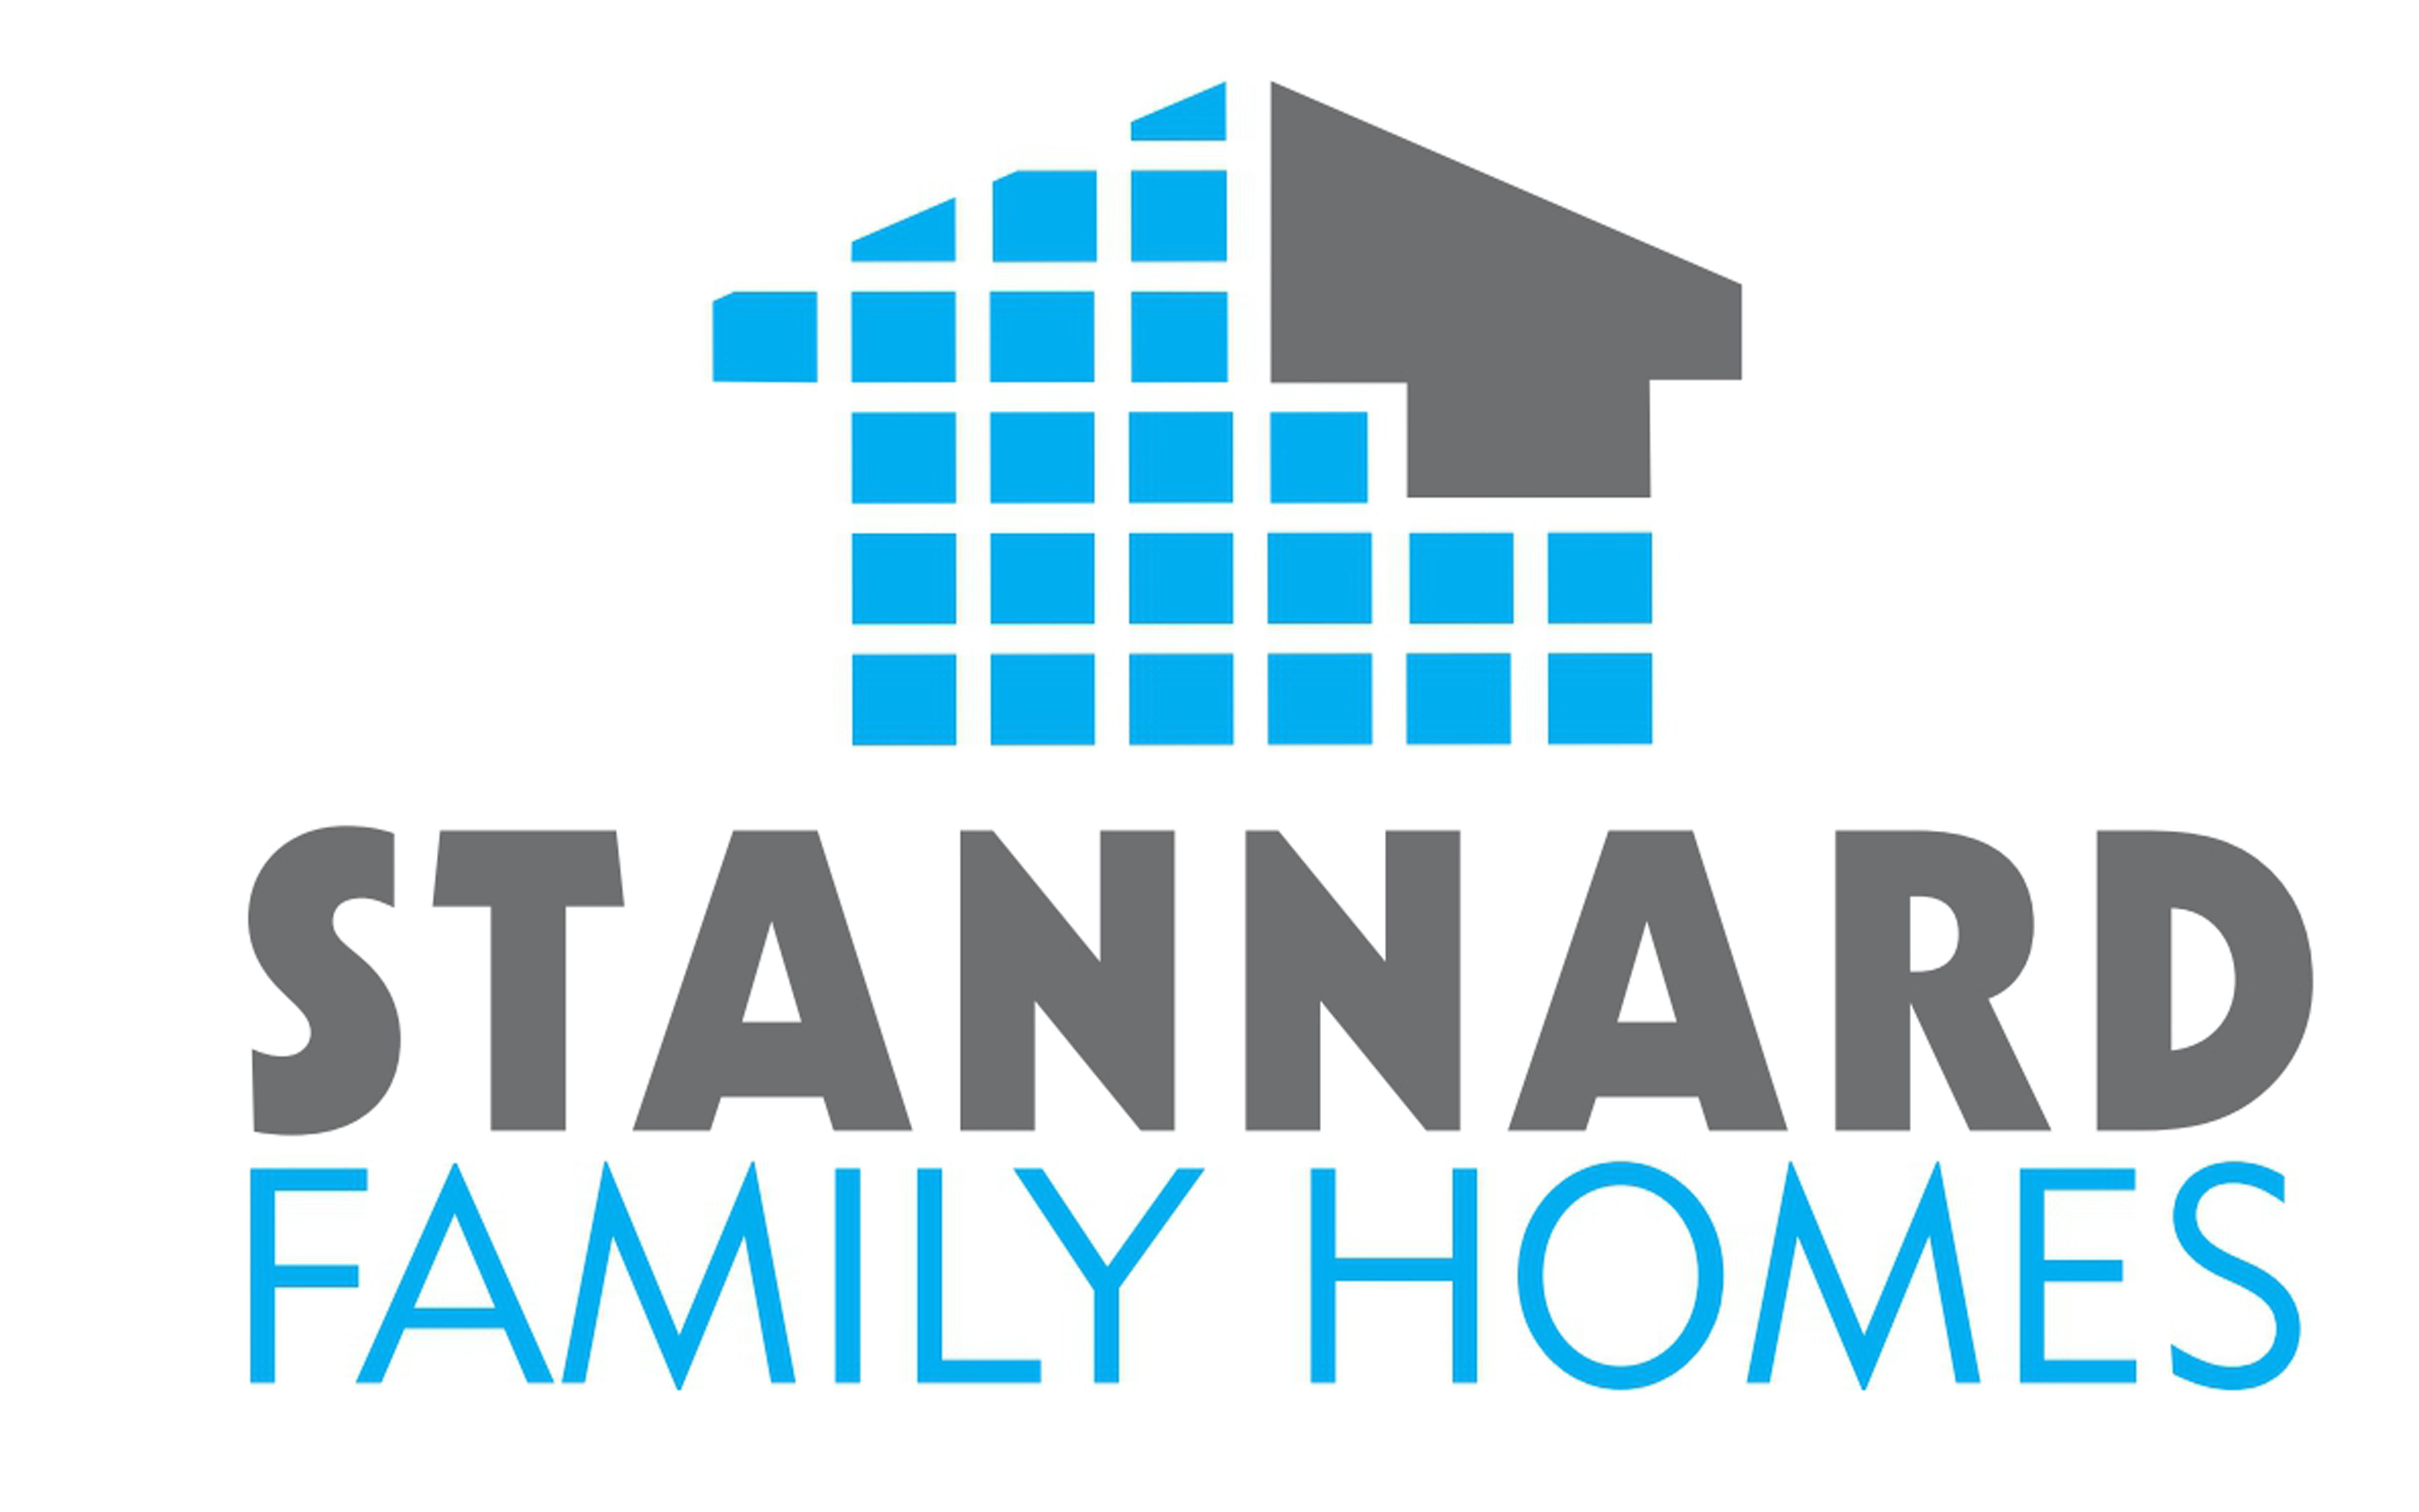 stannard family homes logo